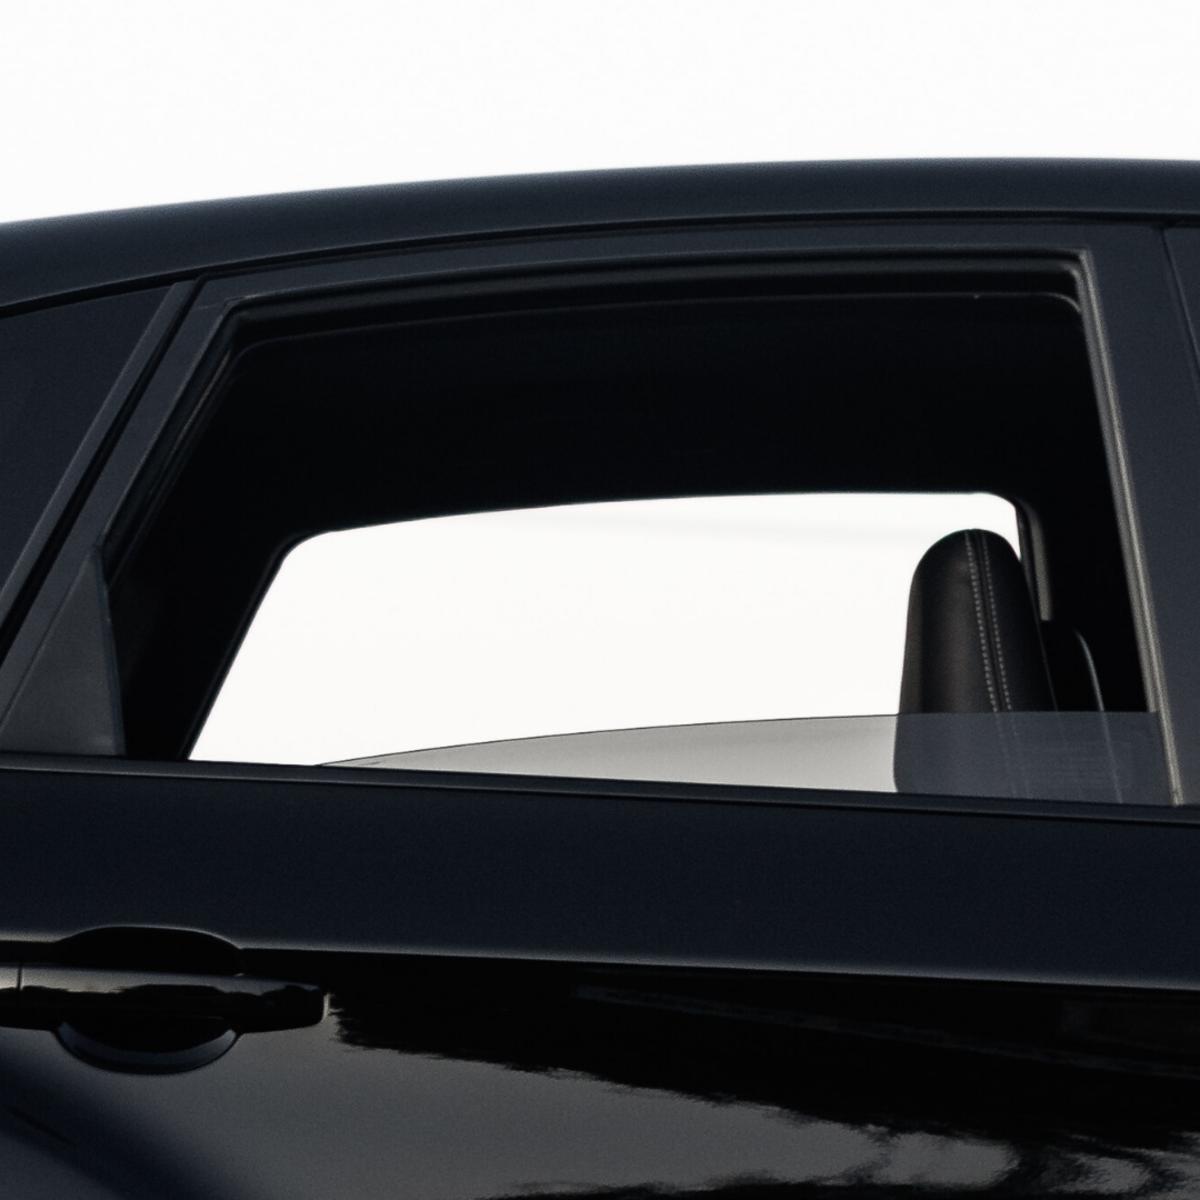 Fix a Stuck Car Window Manually